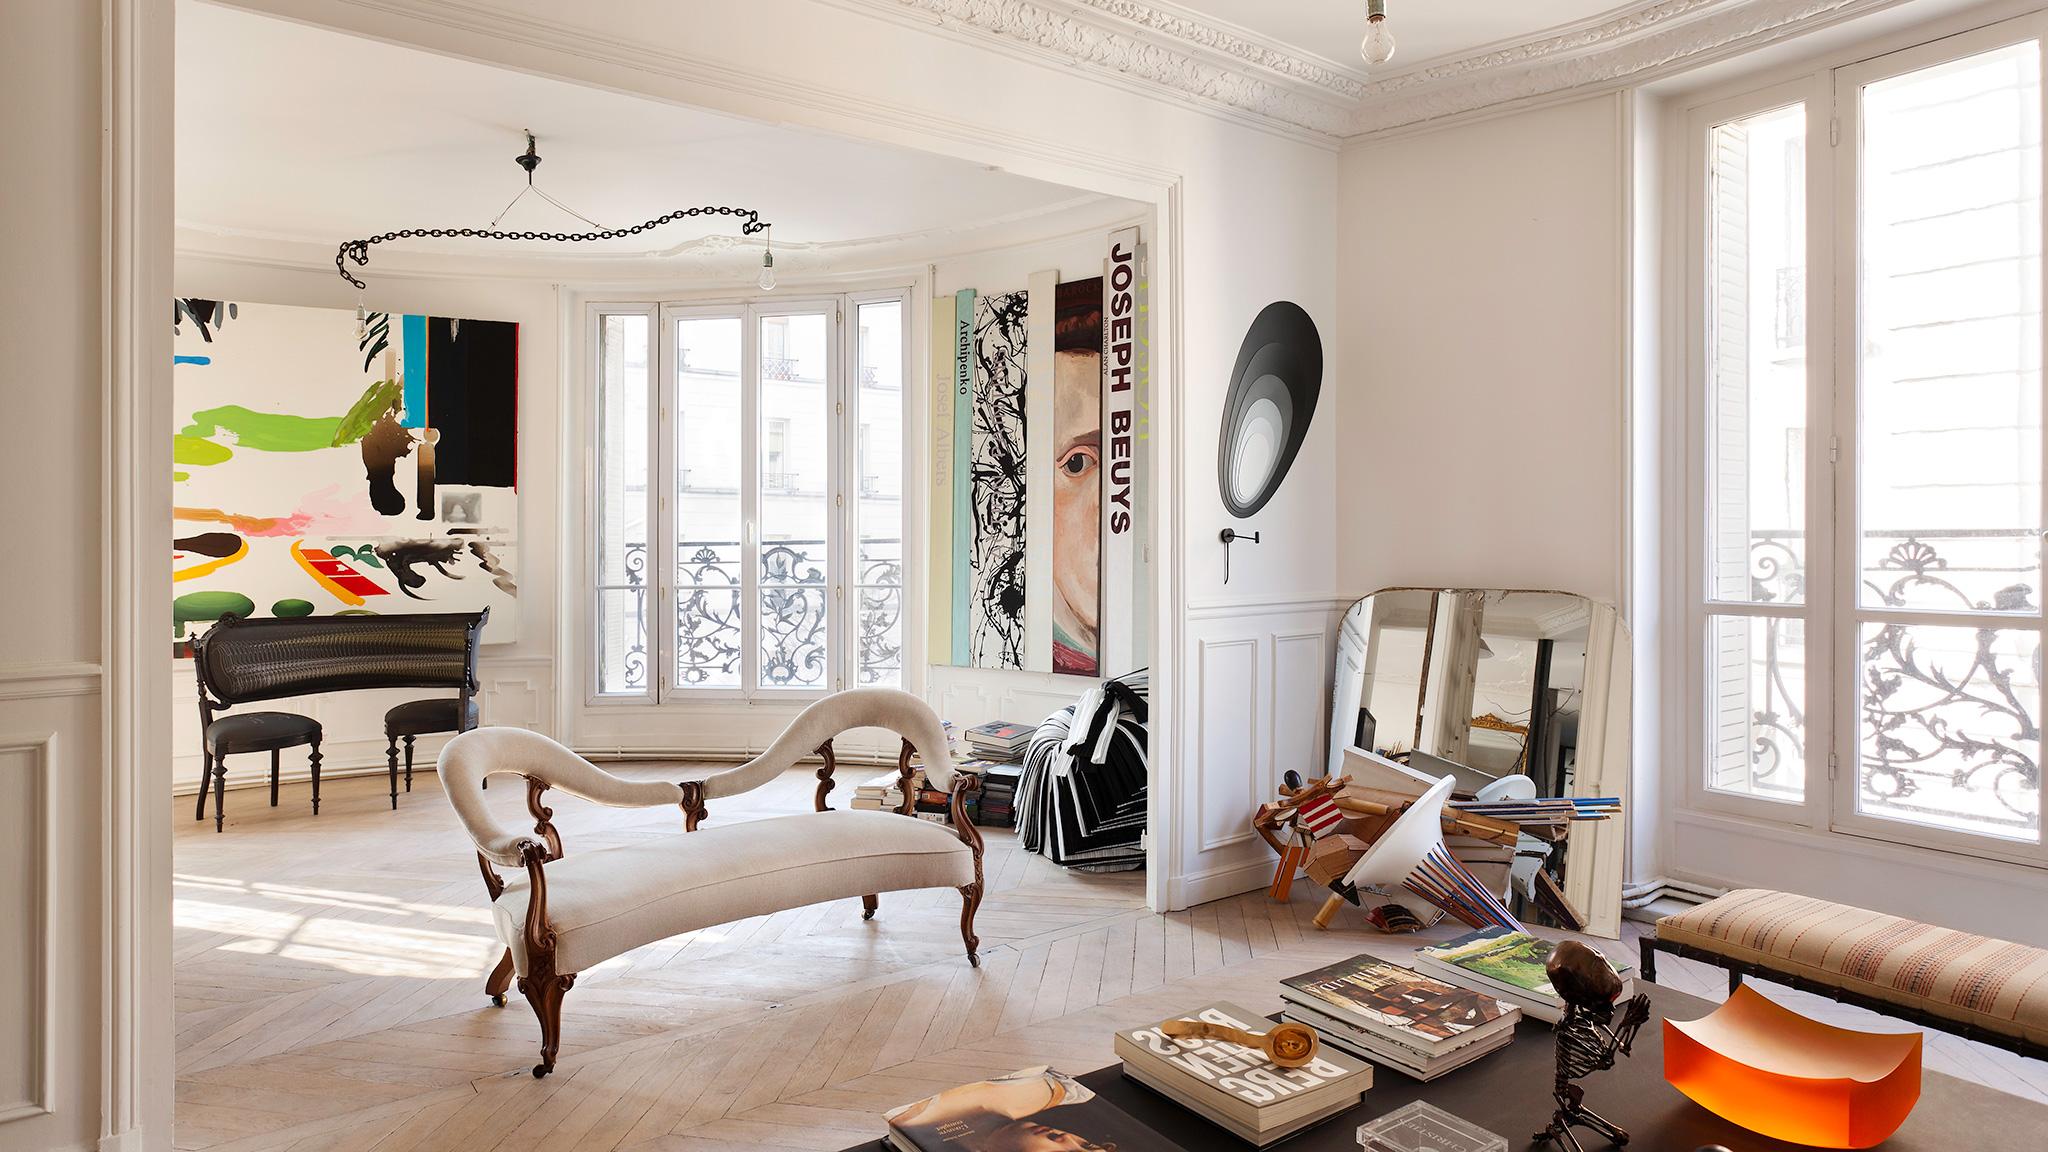 Separation Salon Chambre Studio french style forward   financial times